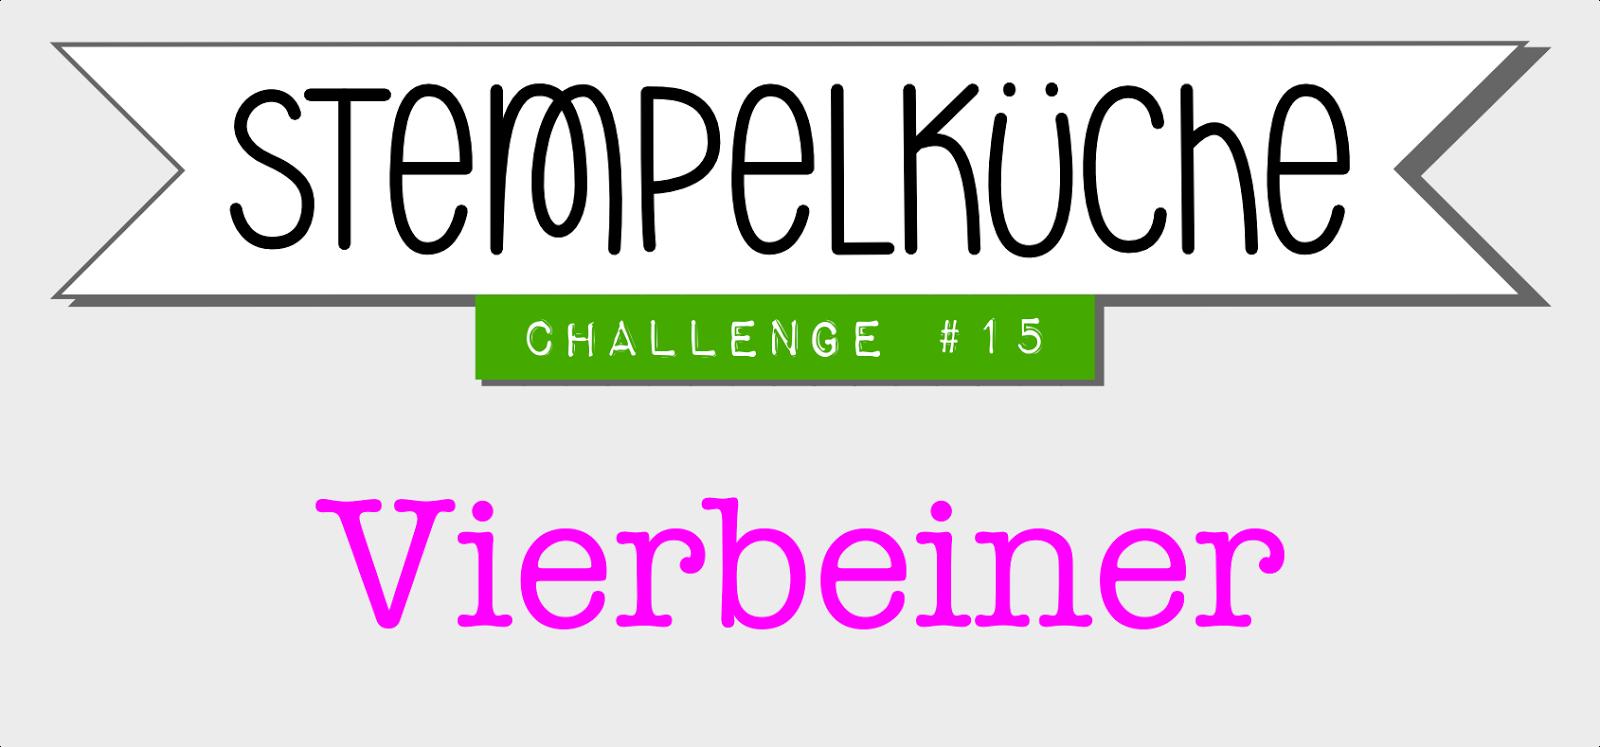 http://stempelkueche-challenge.blogspot.de/2015/03/stempelkuche-challenge-15-vierbeiner.html